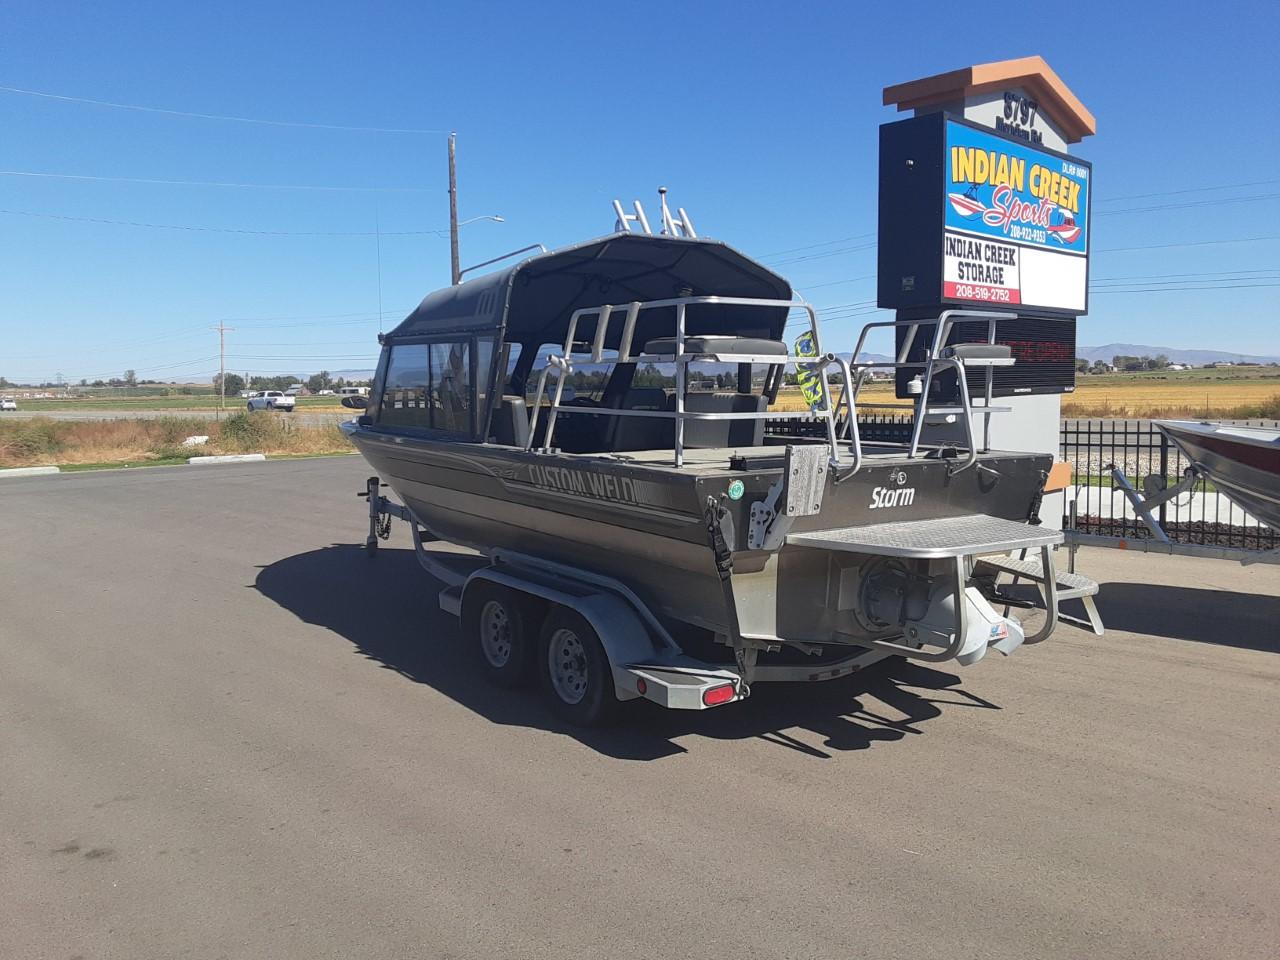 2004 Custom Weld Storm 21ft boat – $45,900